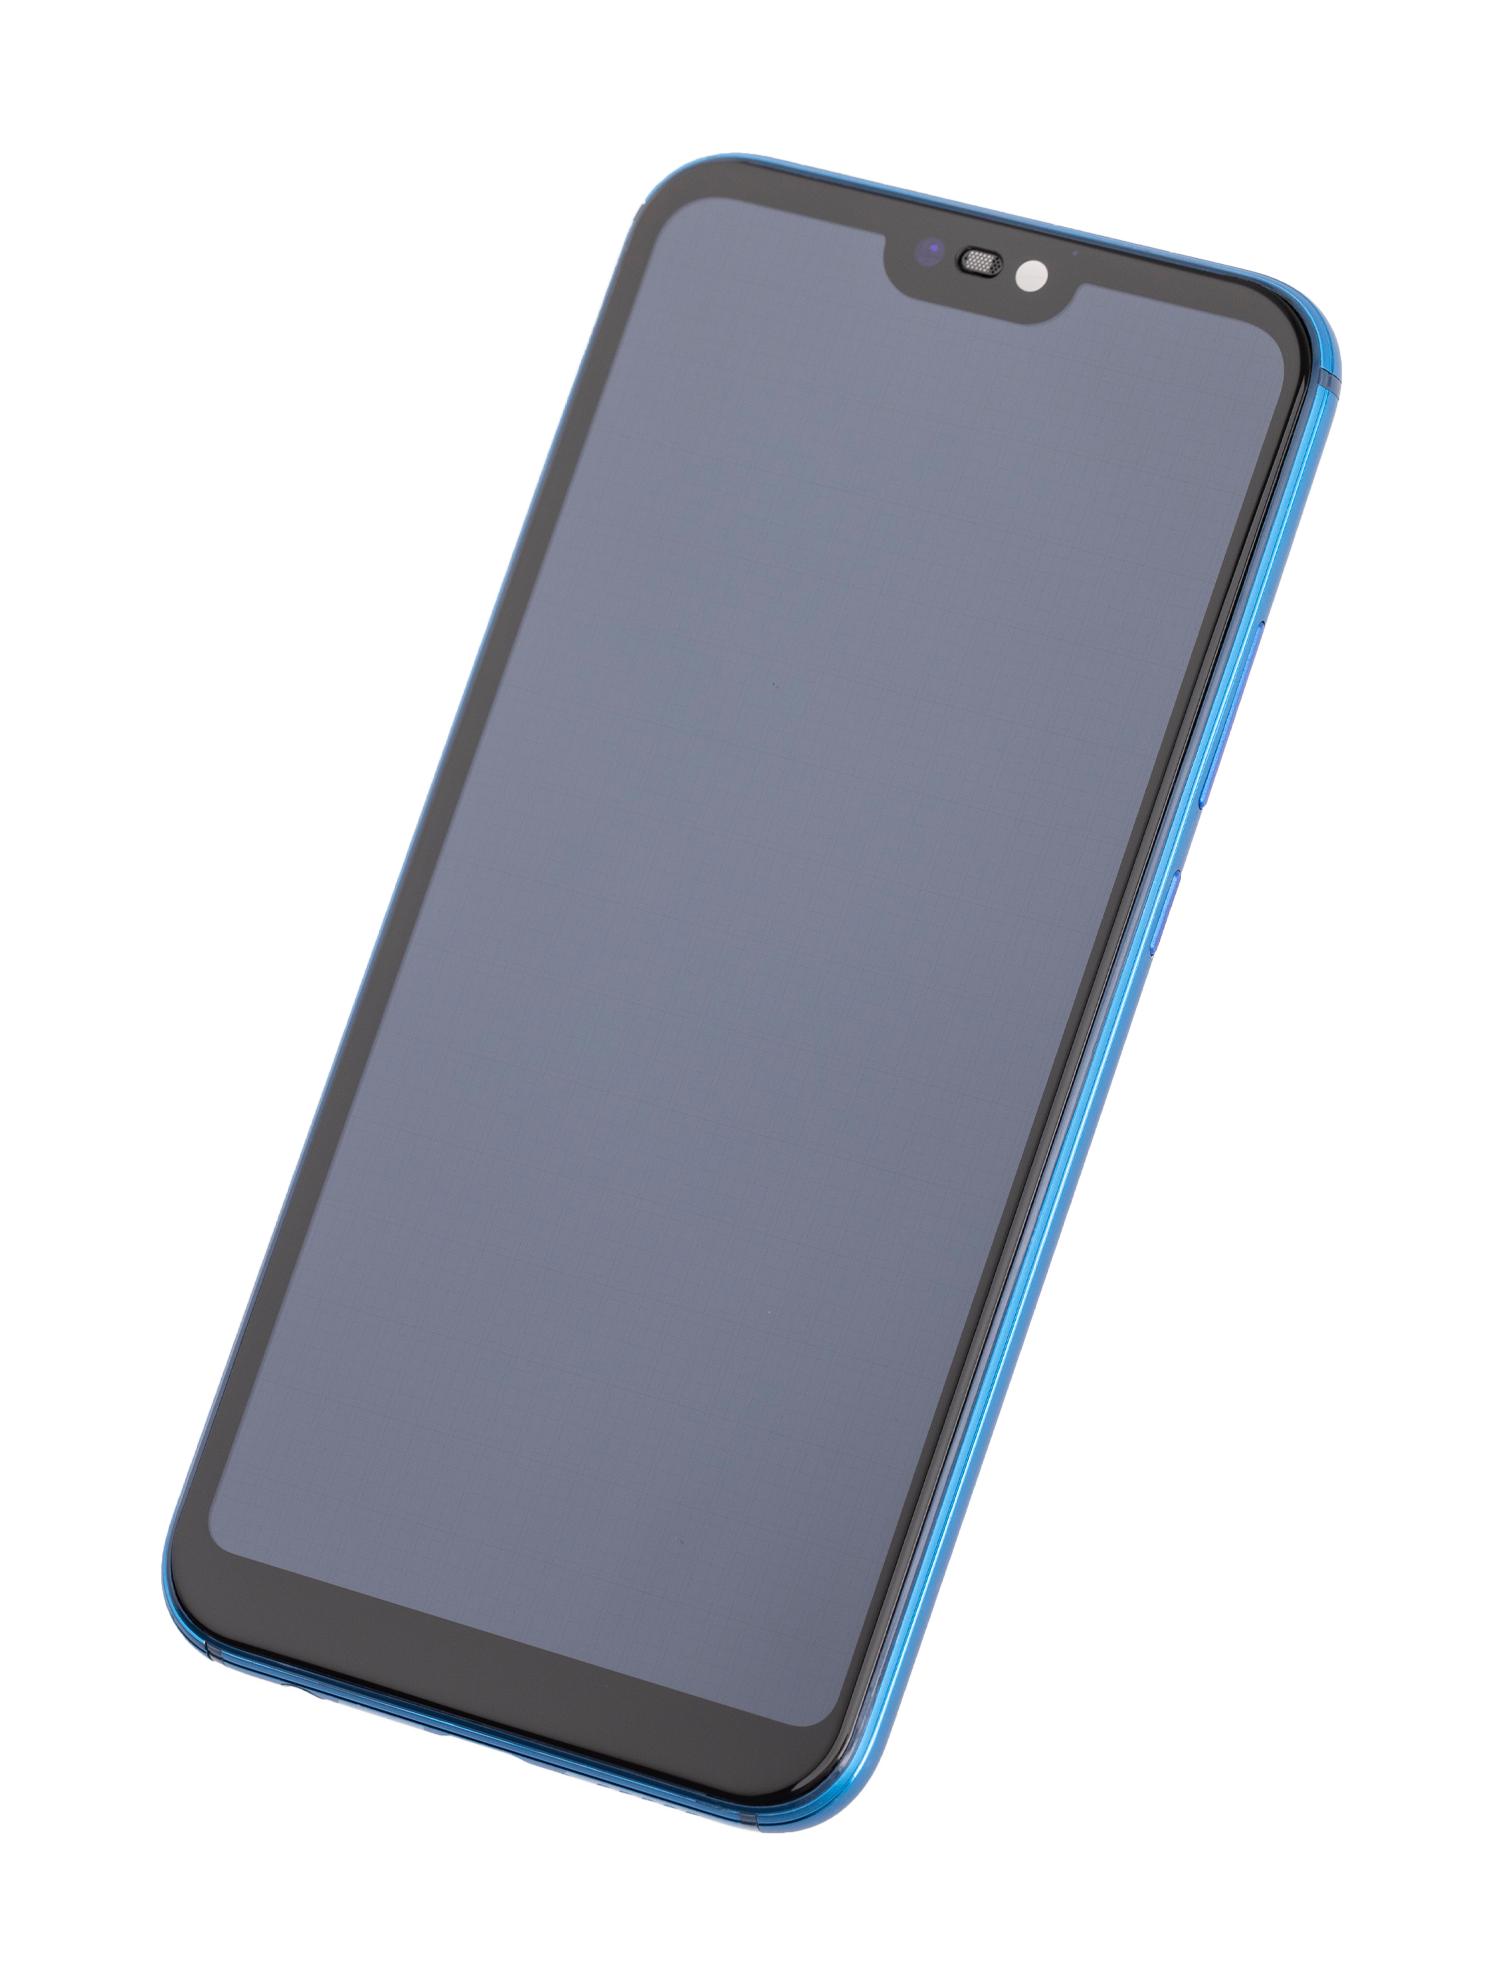 Huawei P20 Lite ANE-LX1 Display Module + Frame Blue